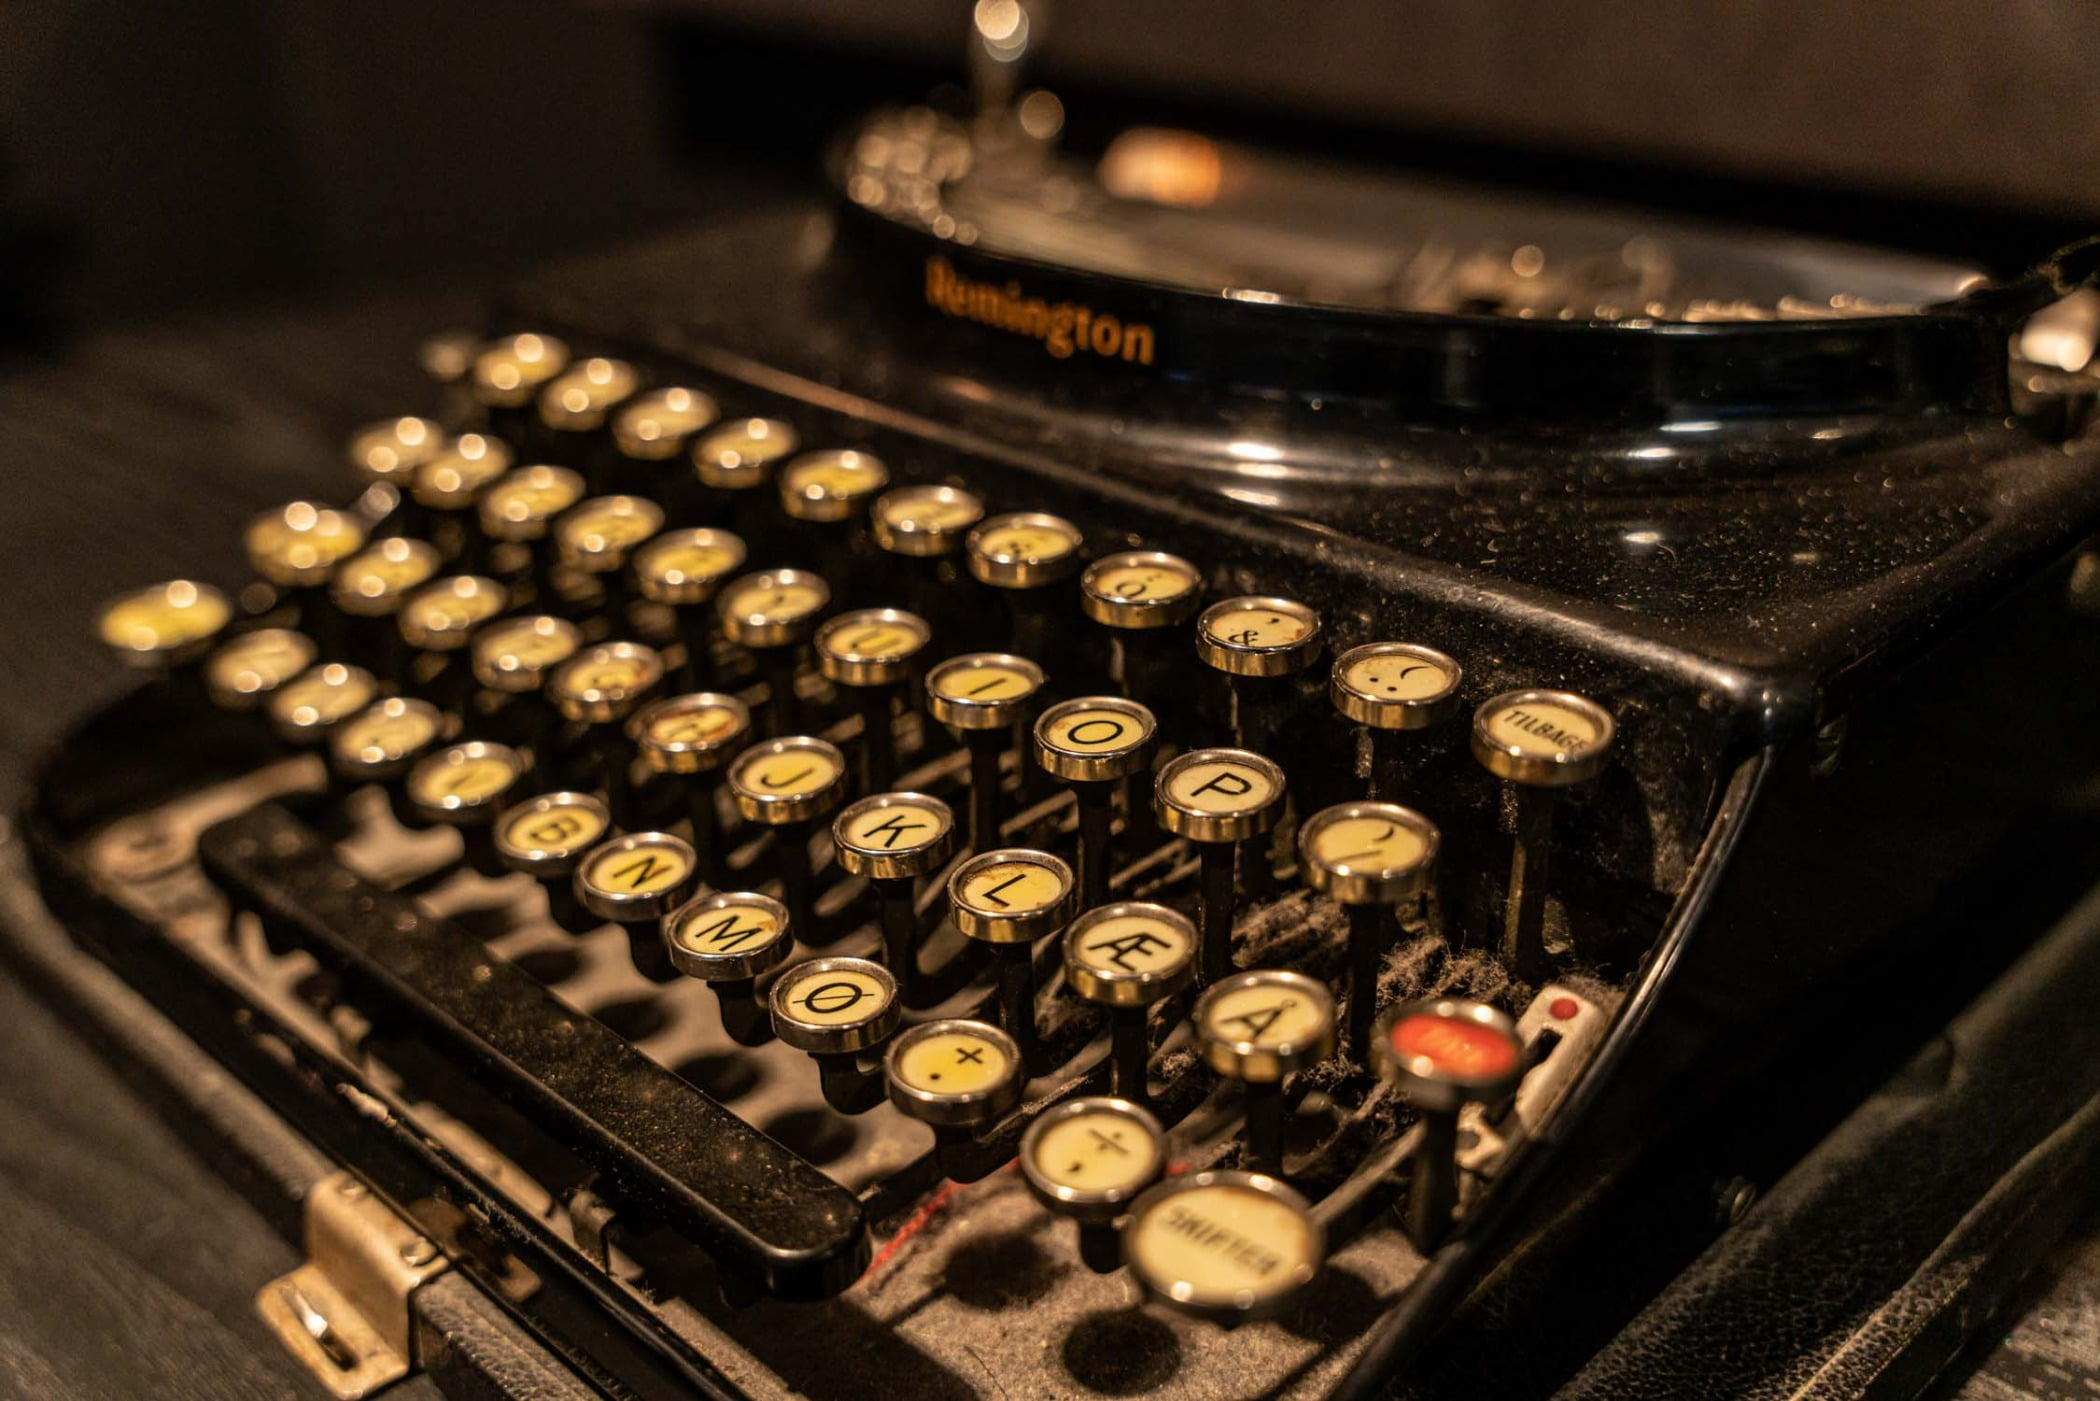 Space bar, Office supplies, Typewriter